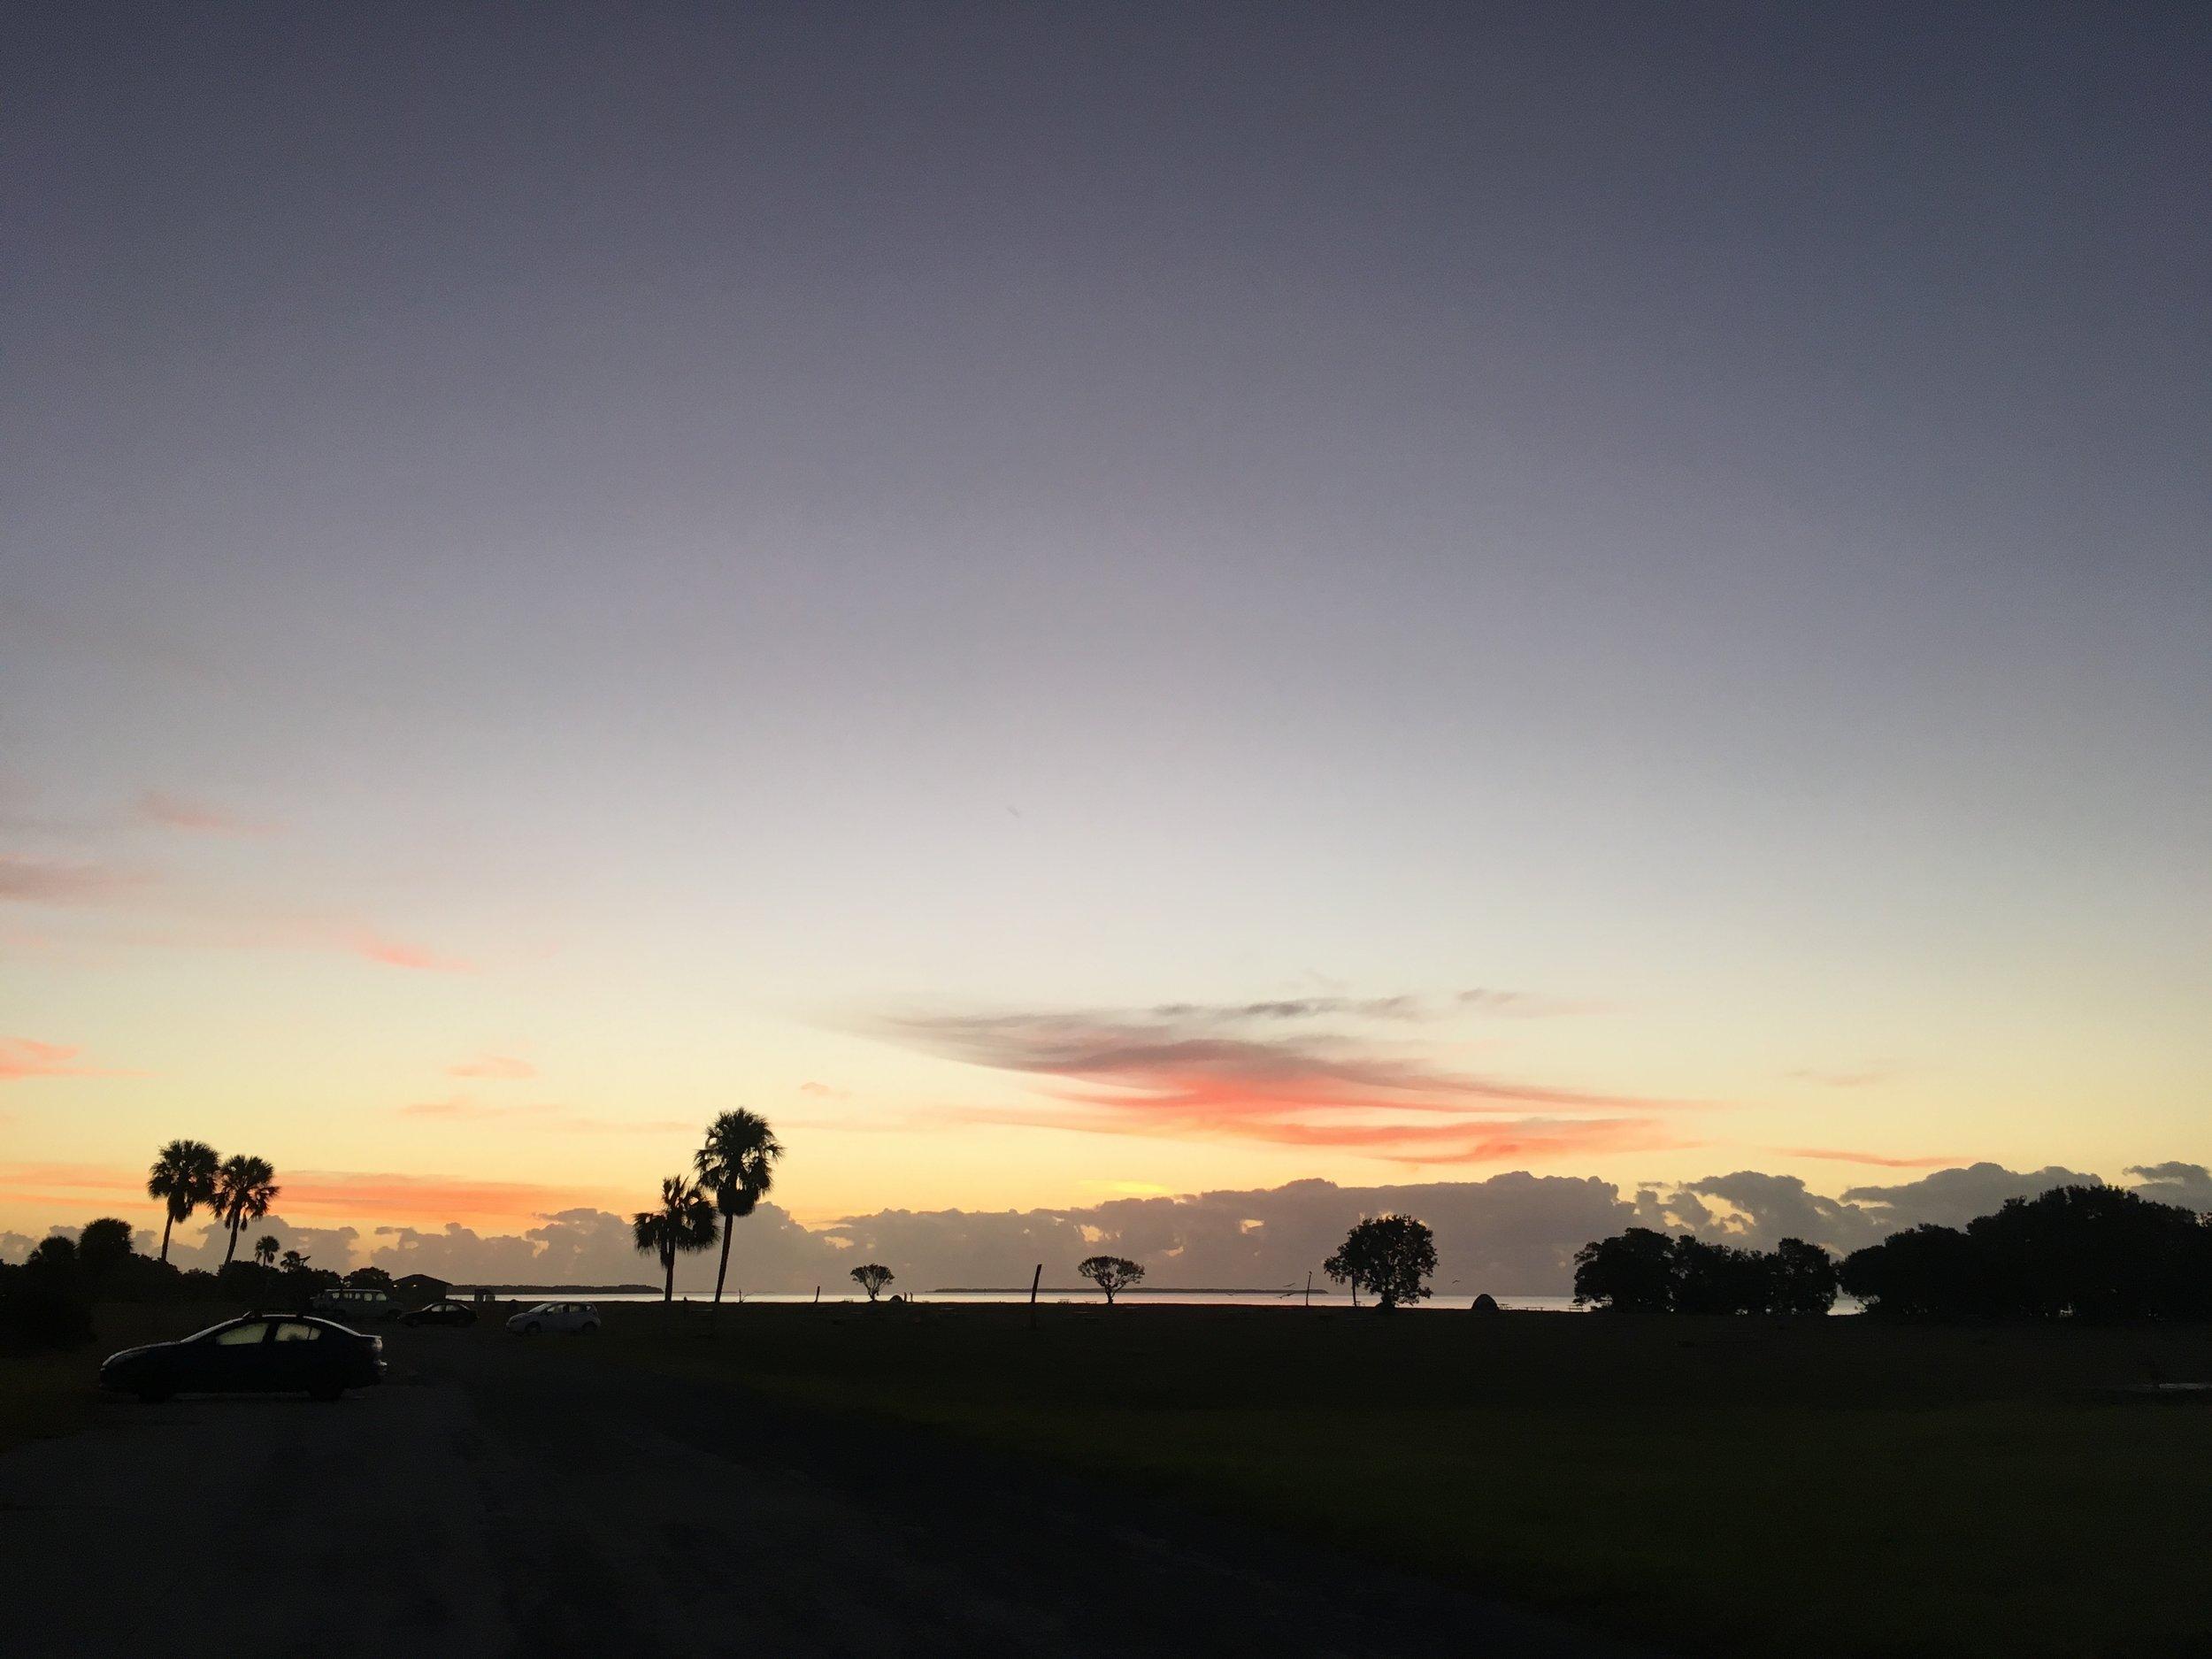 Daybreak at Flamingo, Everglades National Park.